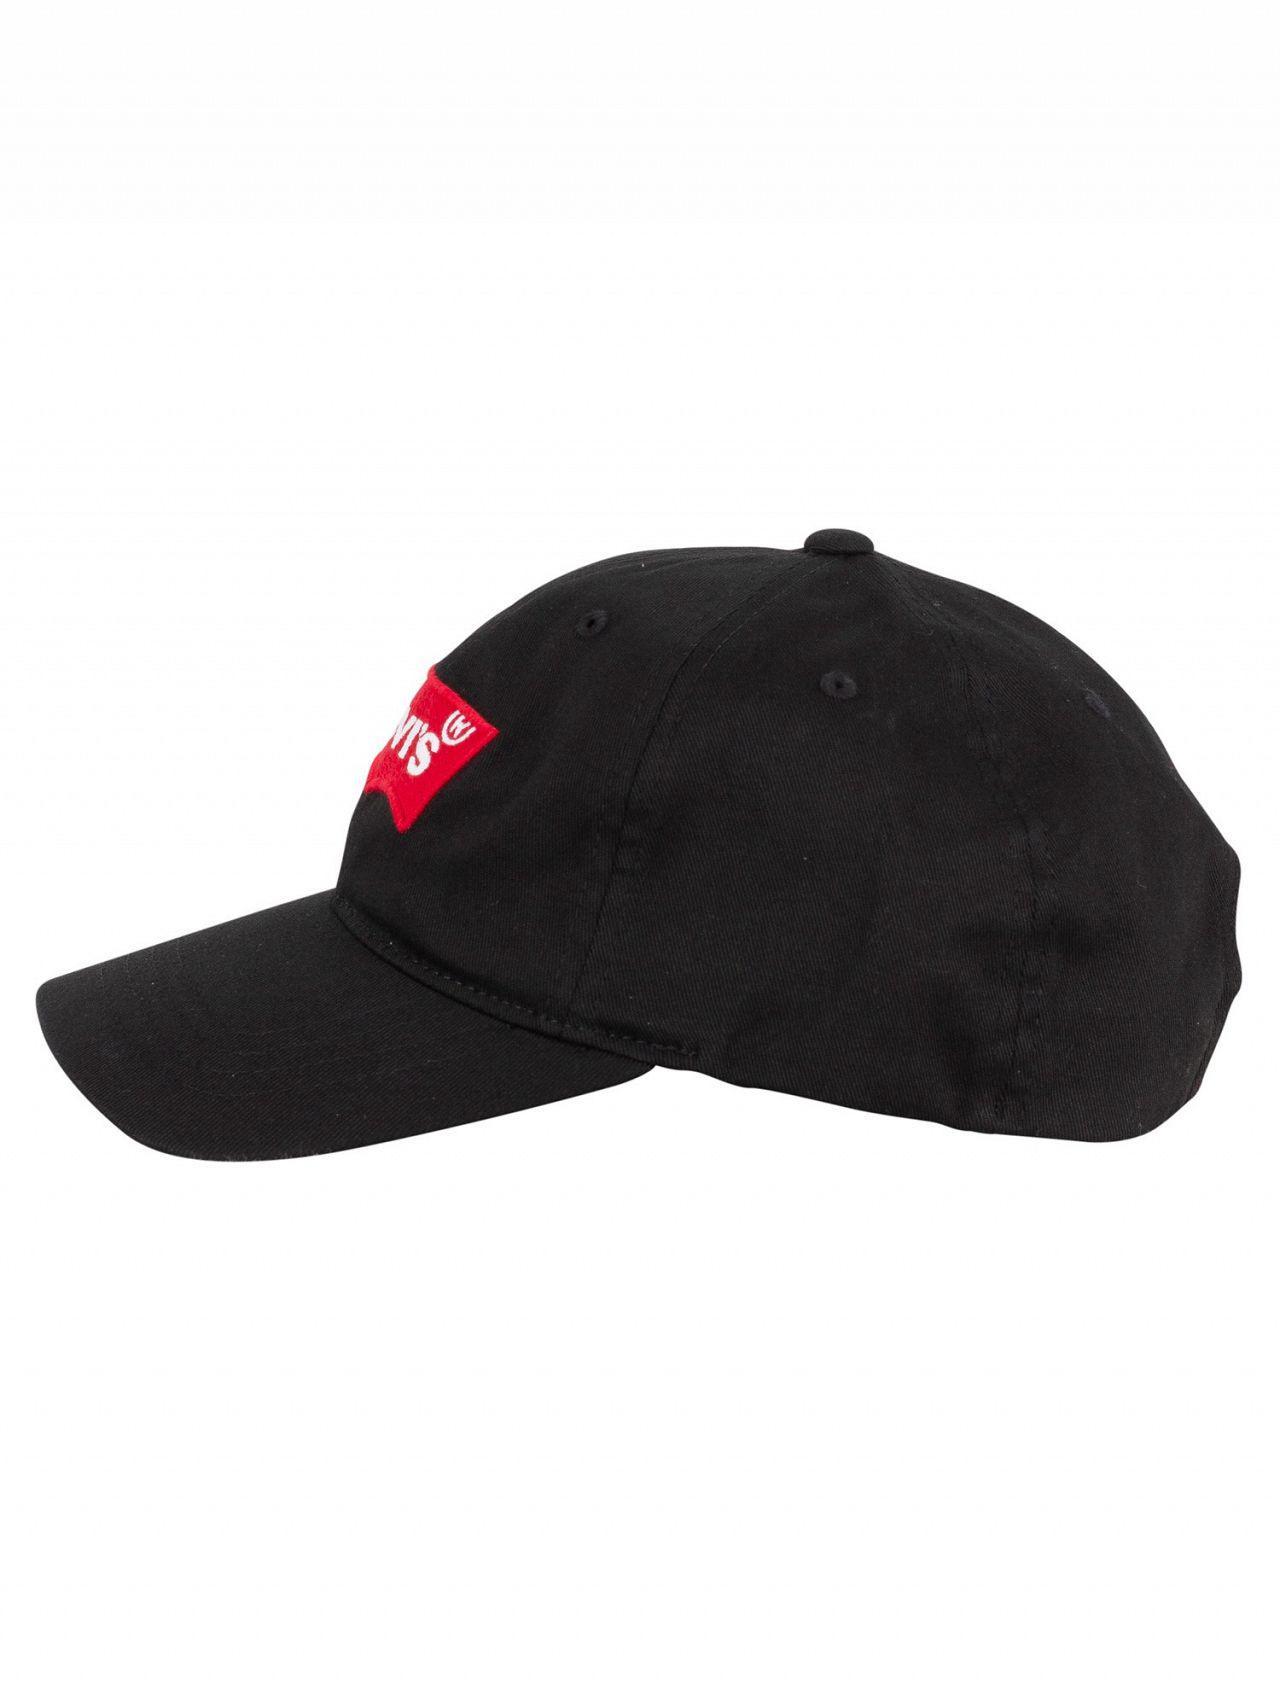 3eaf8ebf Levi's Black Batwing Flex Fit Baseball Cap in Black for Men - Lyst